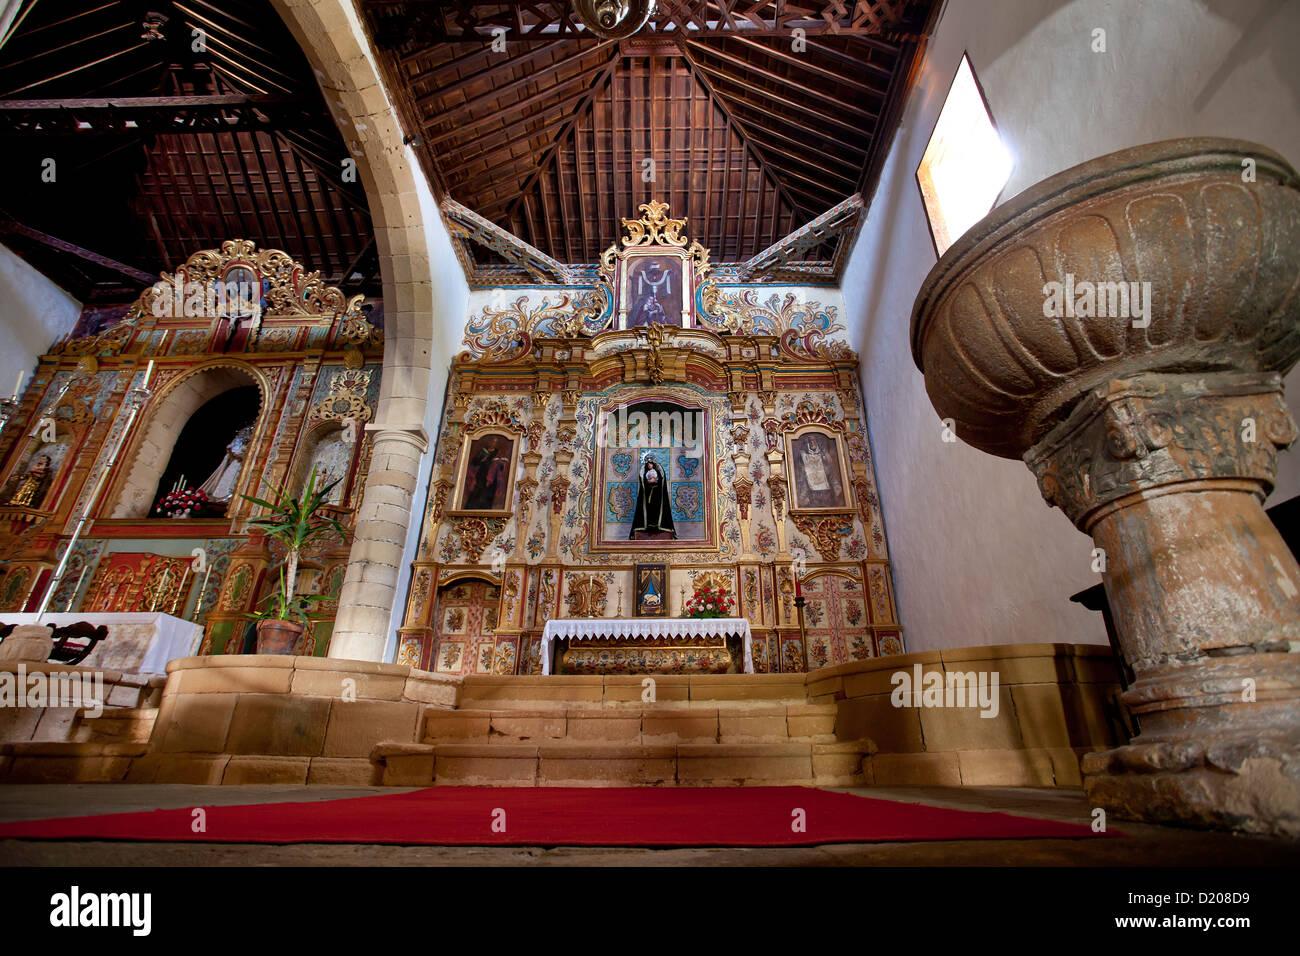 Altar, church Iglesia de Virgin de la Regla, Pajara, Fuerteventura, Canary Islands, Spain - Stock Image